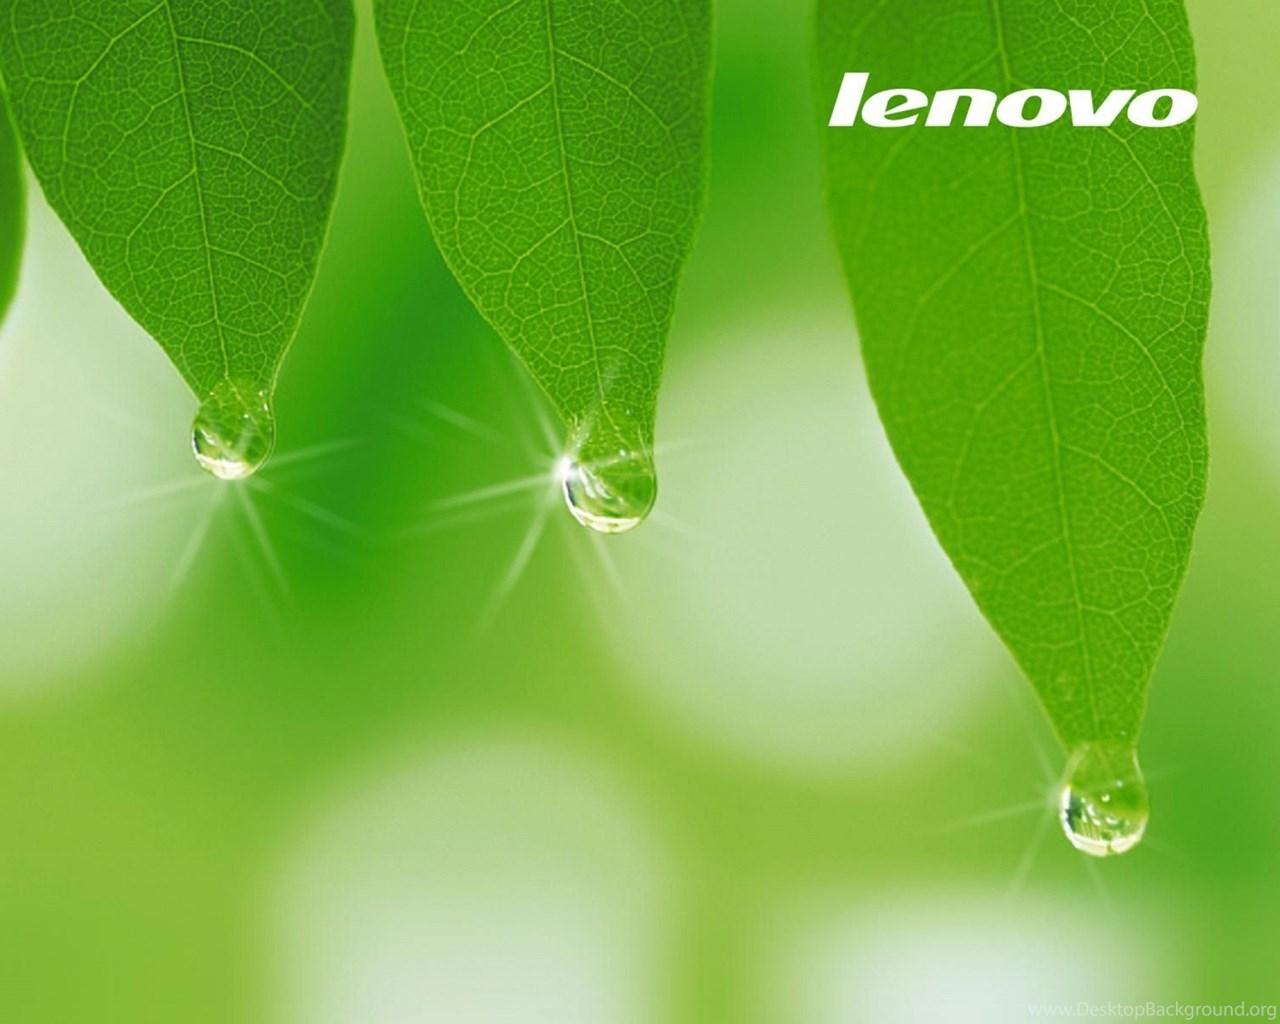 Lenovo wallpaper free downloadg desktop background widescreen voltagebd Image collections